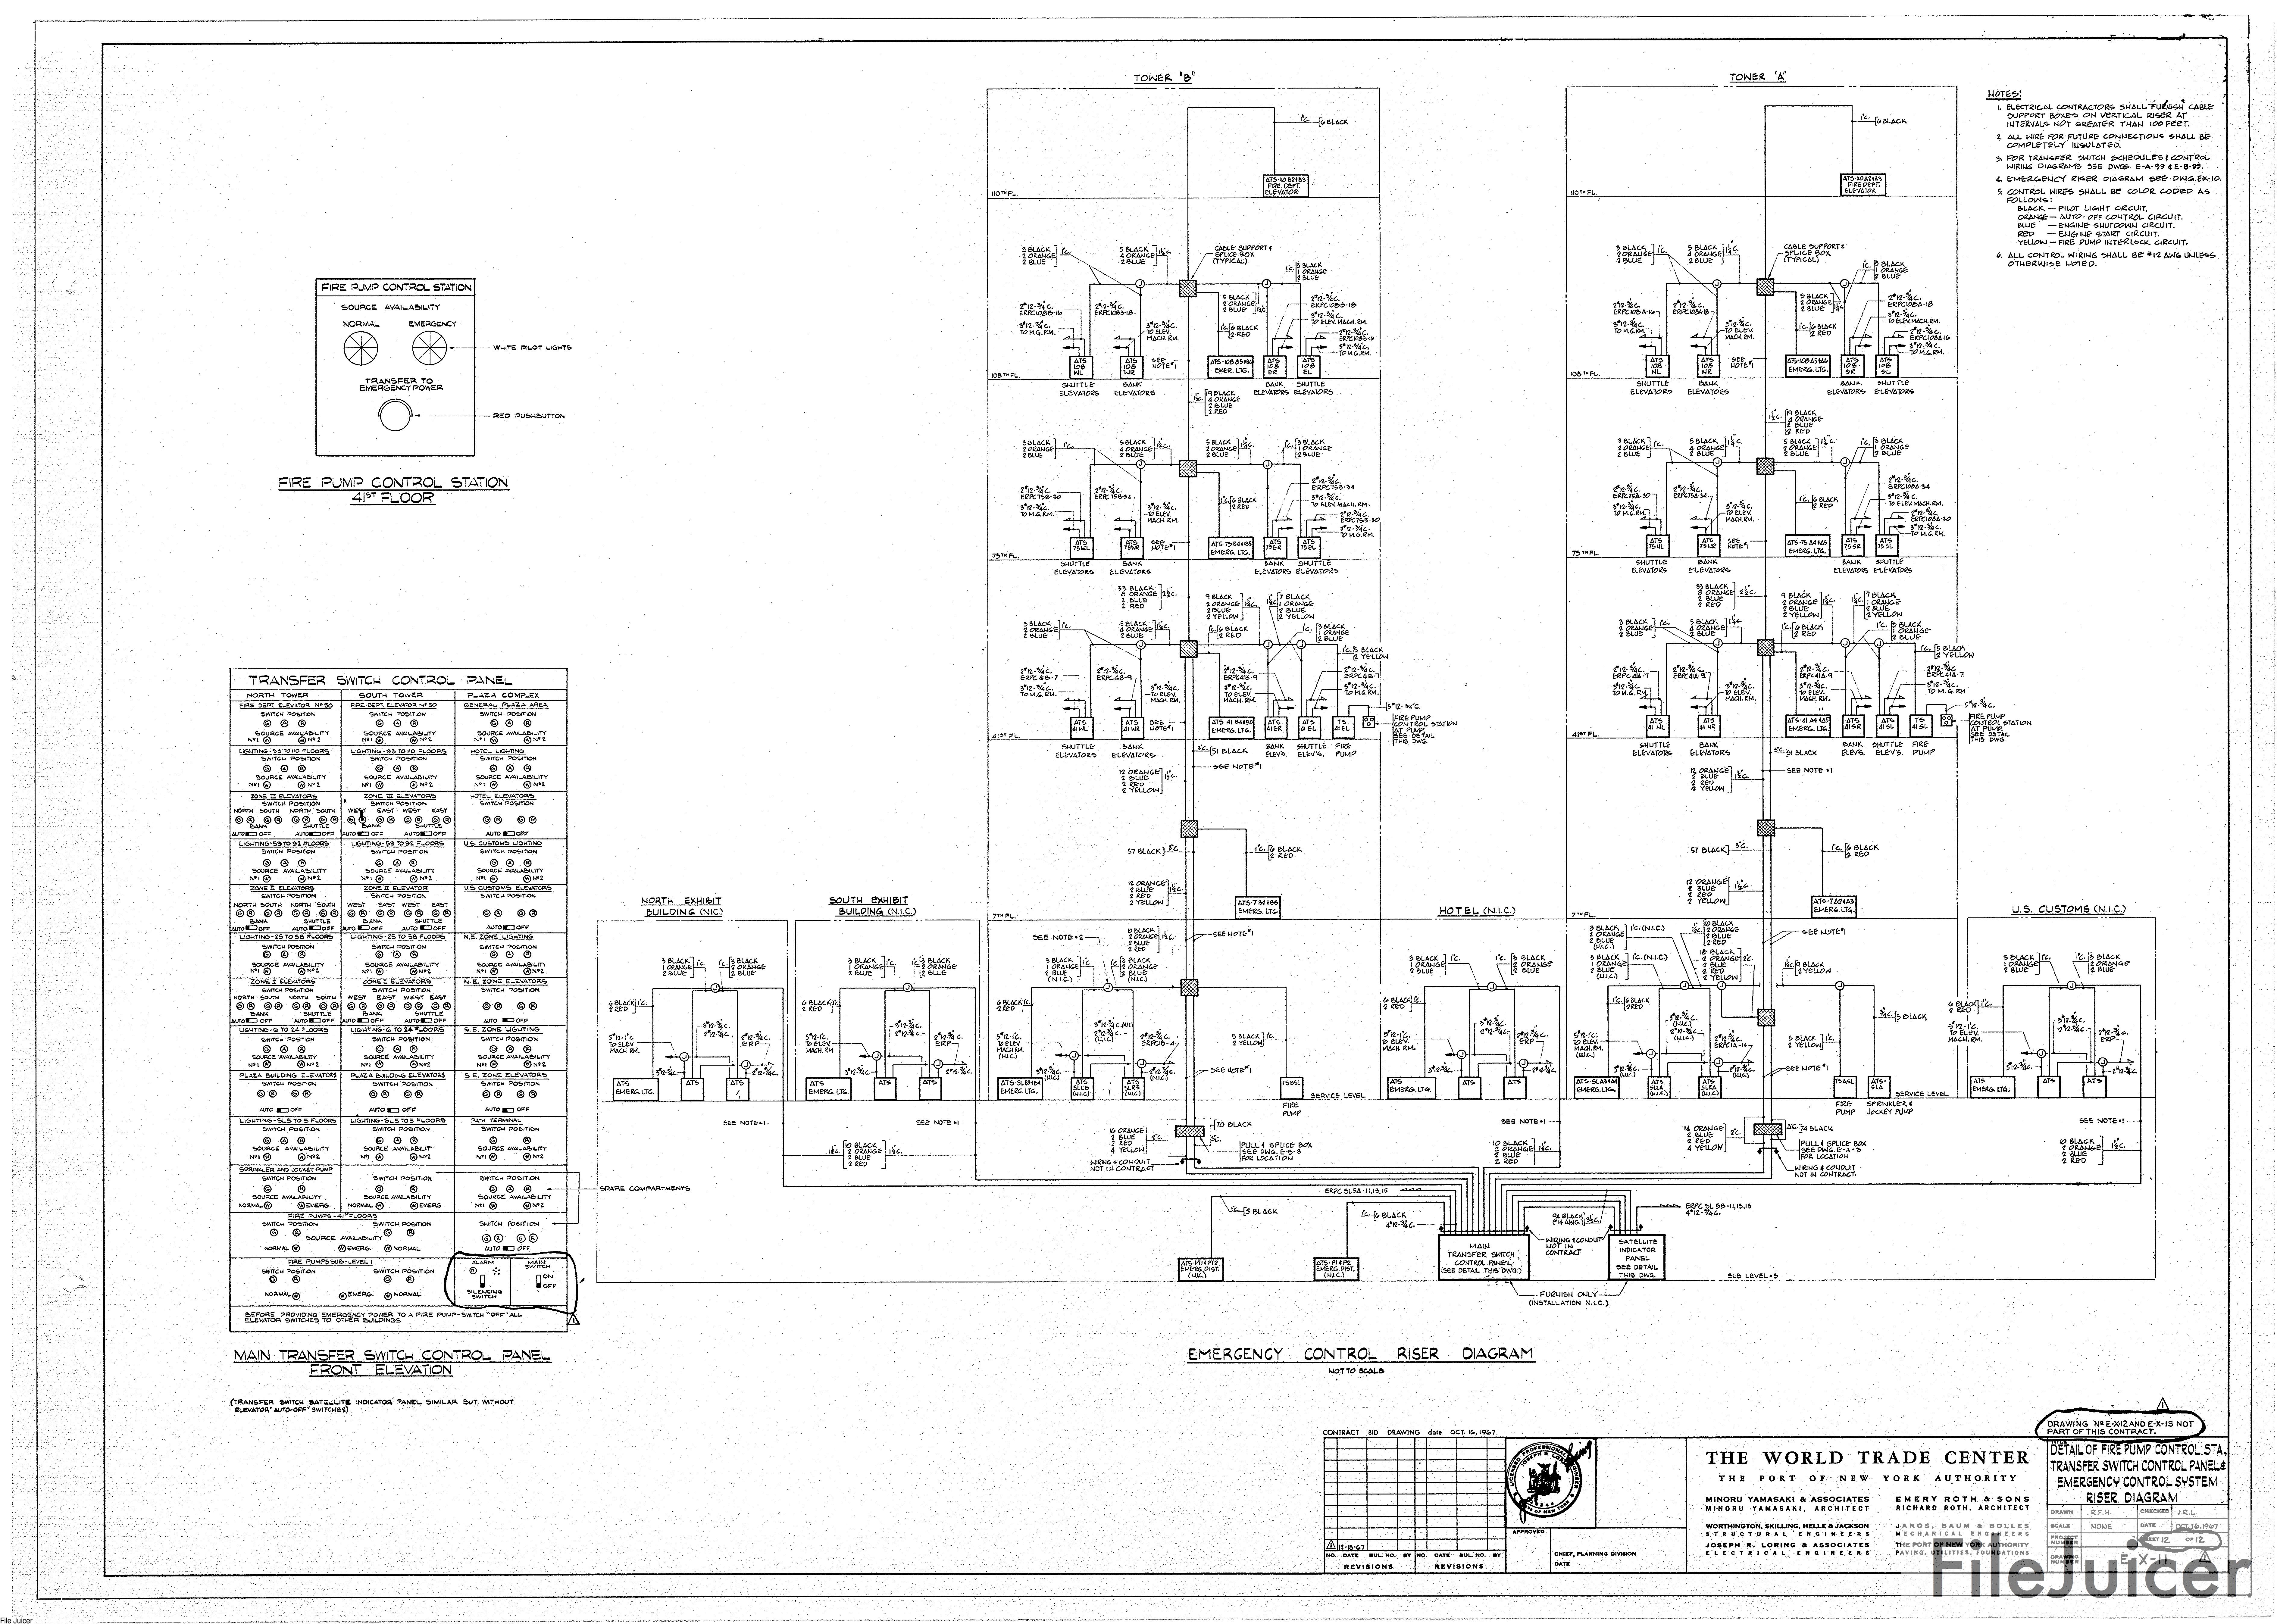 Table Of World Trade Center Tower A Drawings Electrical Diagram Elevator Detailoffirepumpcontrolestatransferswitchcontrolpanelemergencycontrol